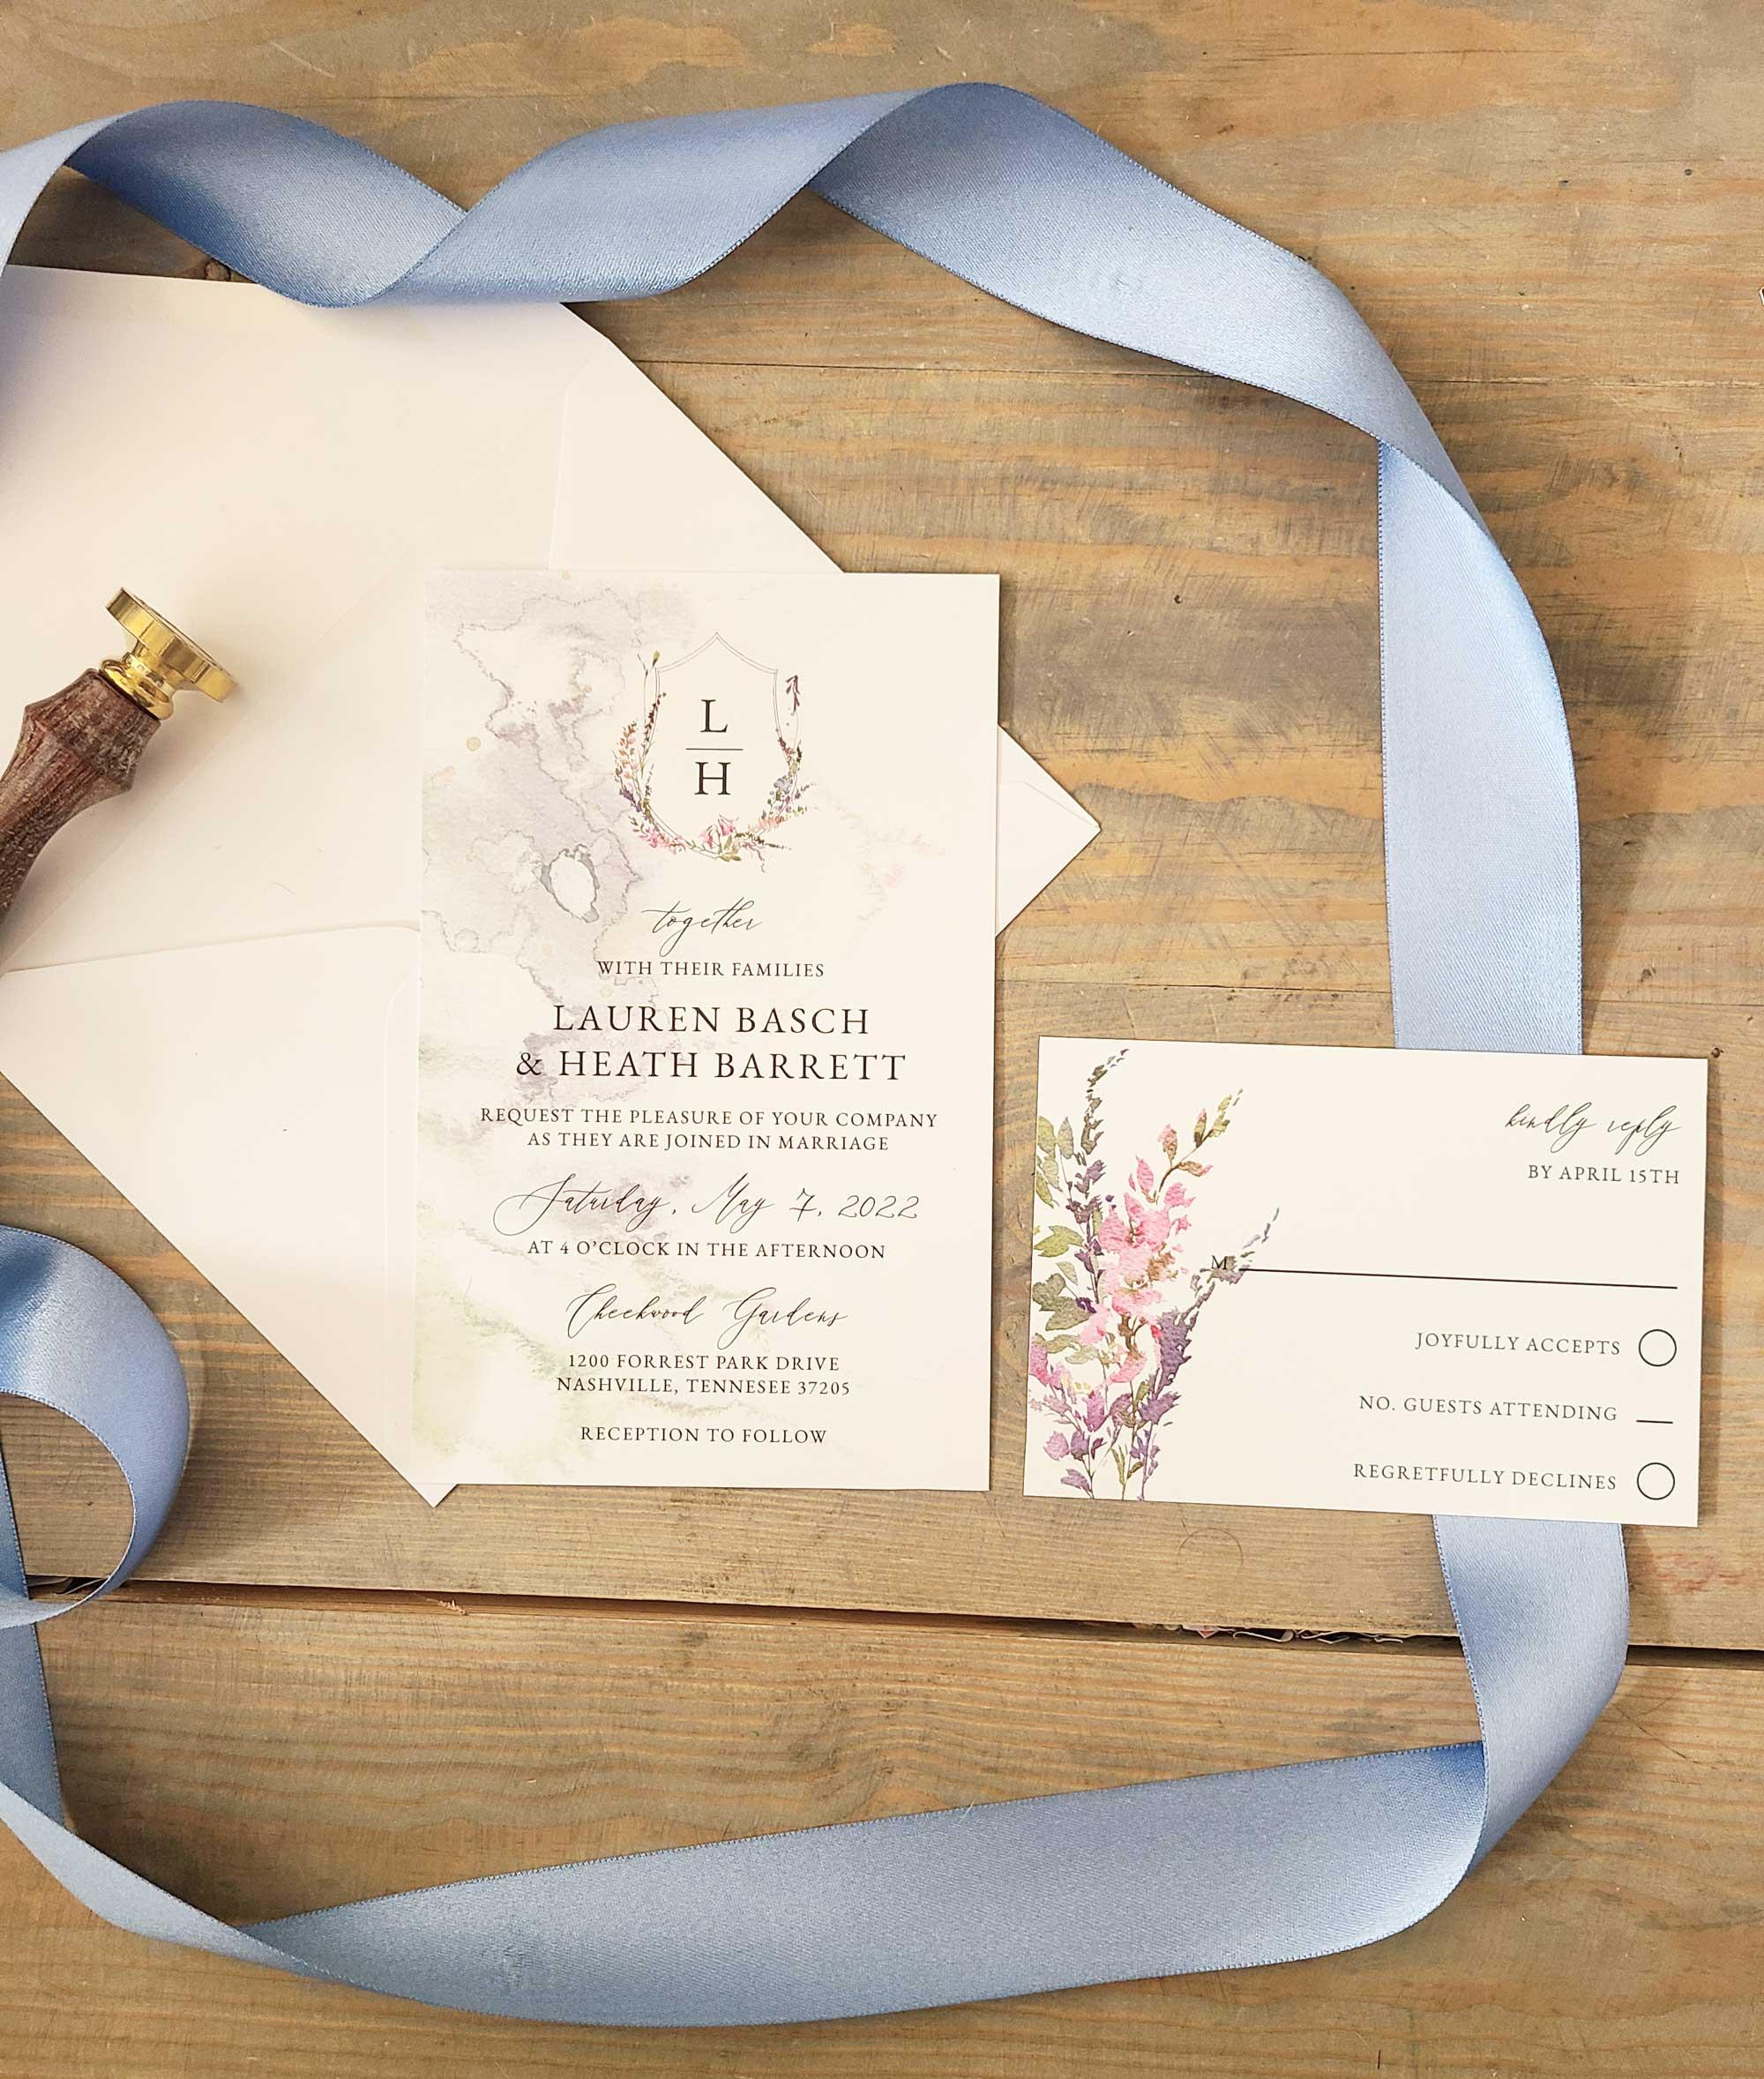 rc0132-bon-matin-monogram-wedding-invitation-5